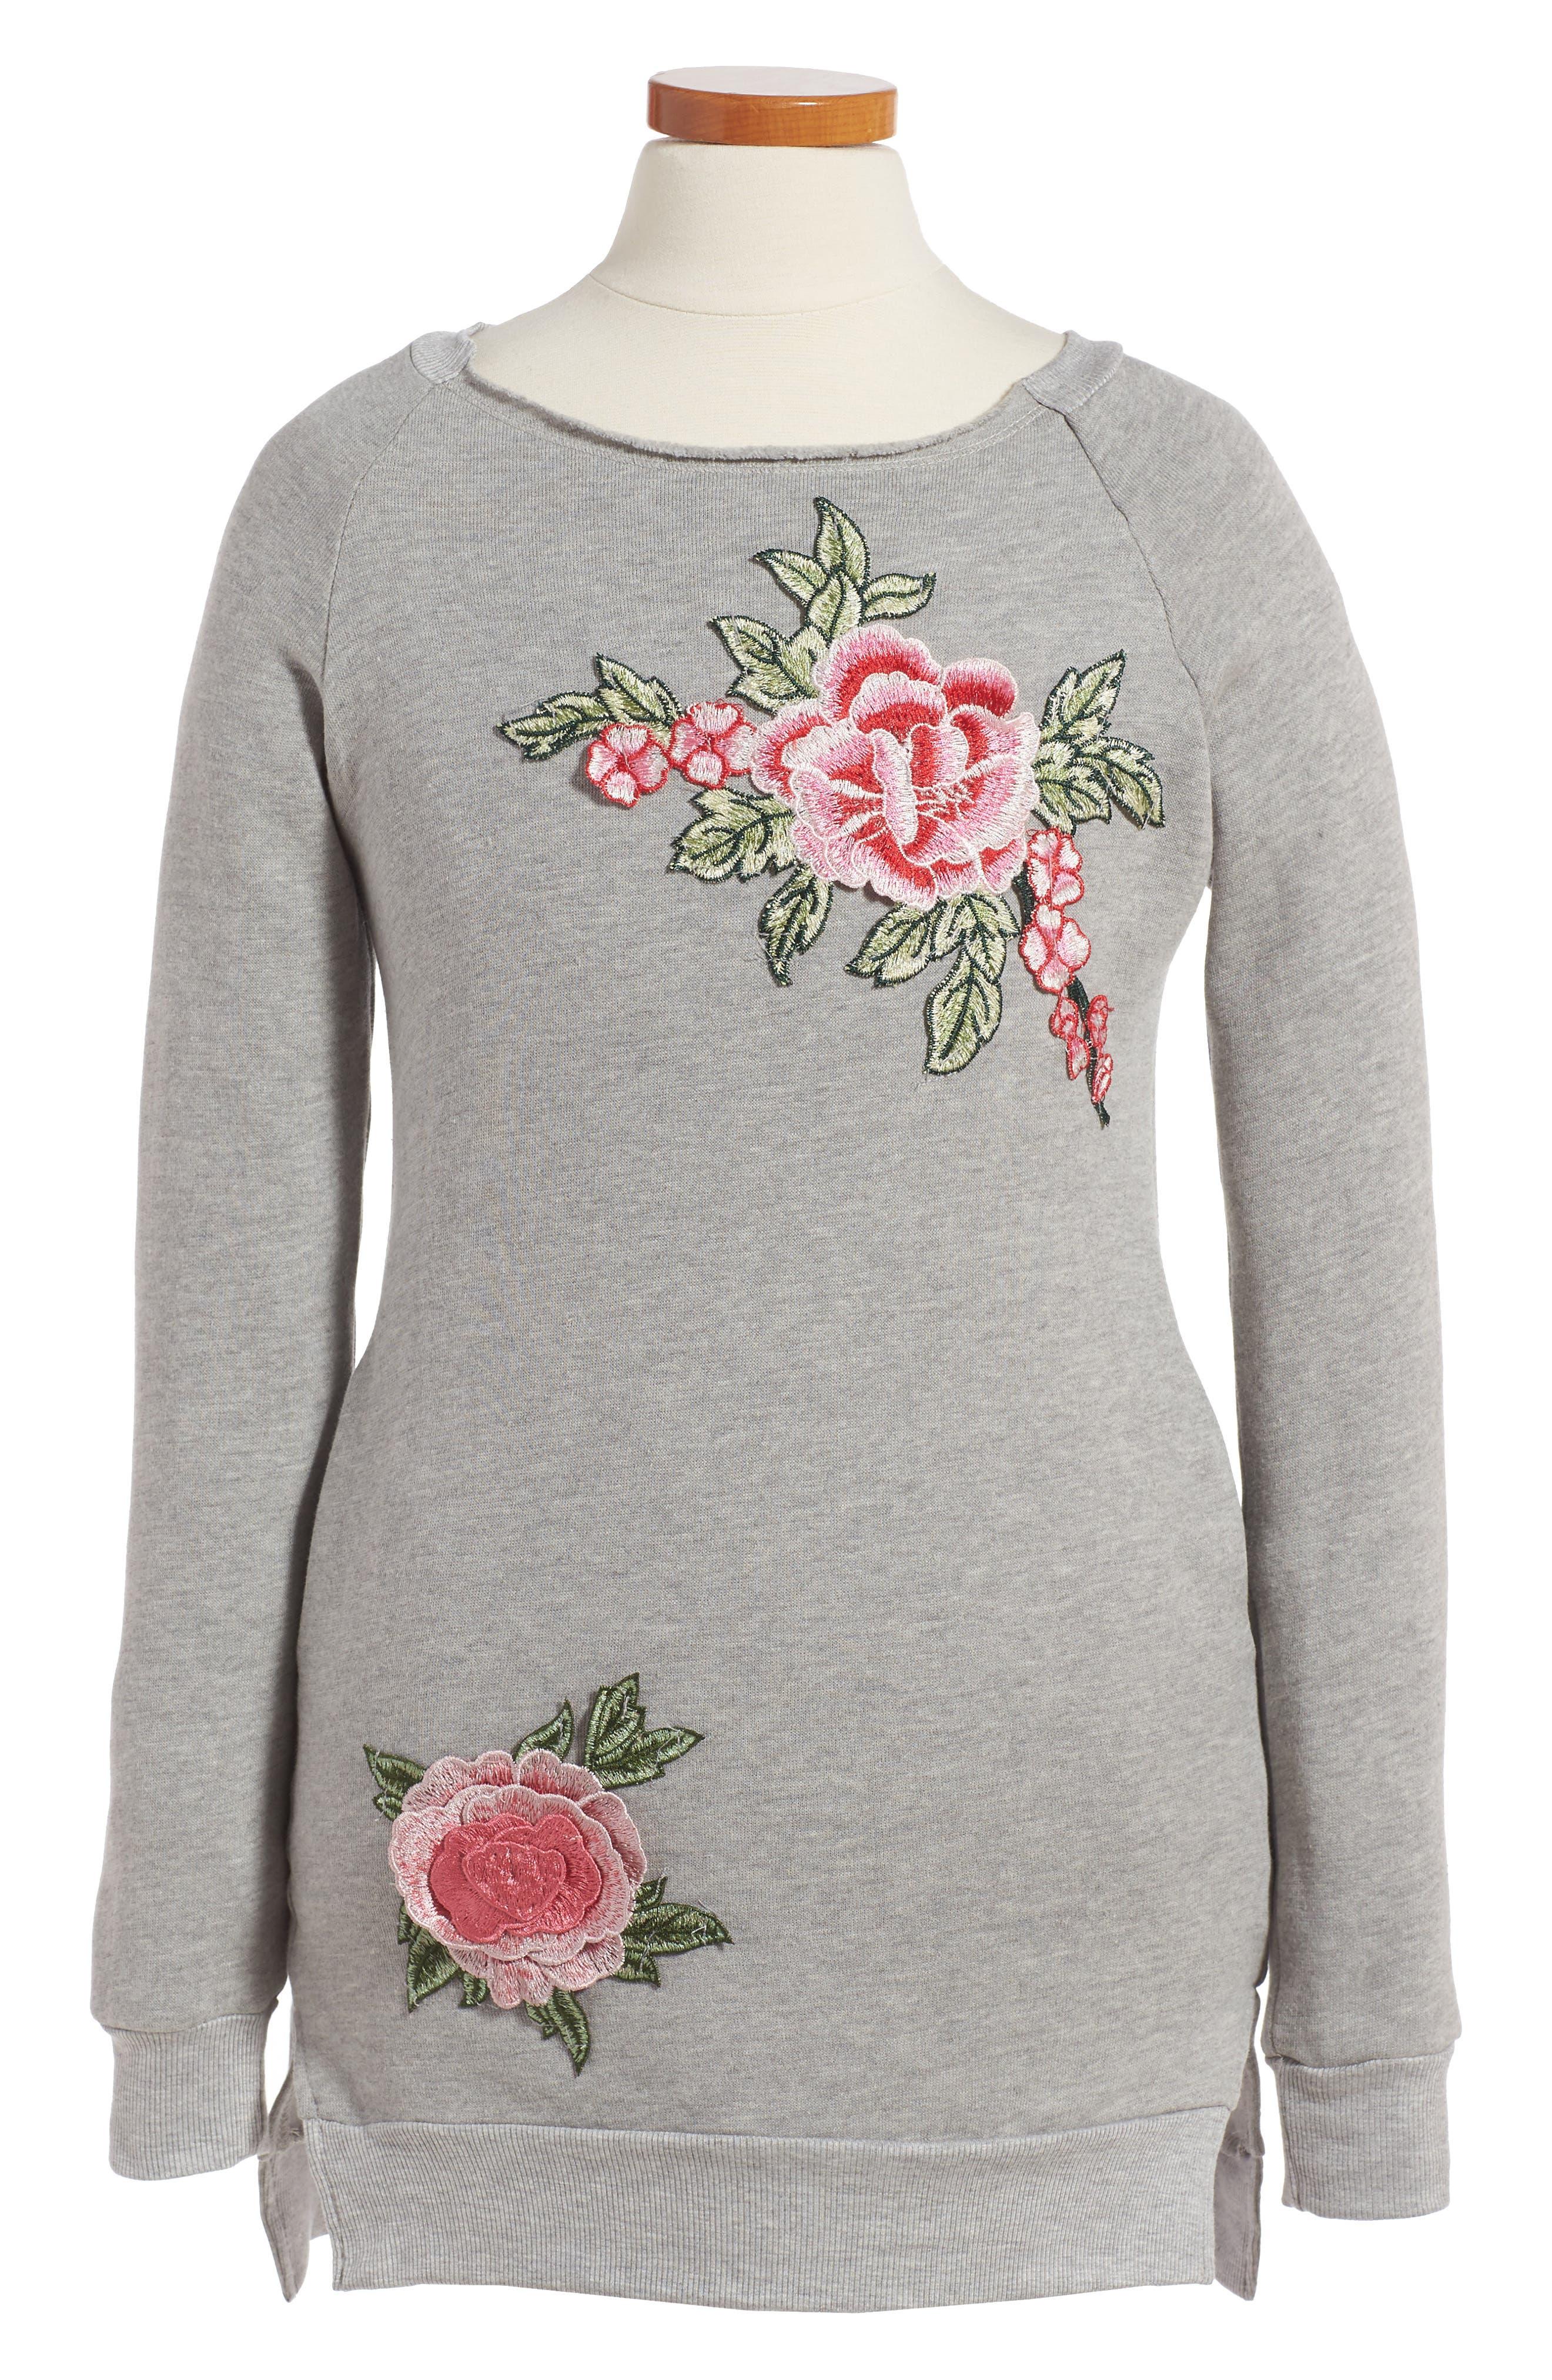 Dreamer Appliqué Sweatshirt Dress,                         Main,                         color, Heather Grey